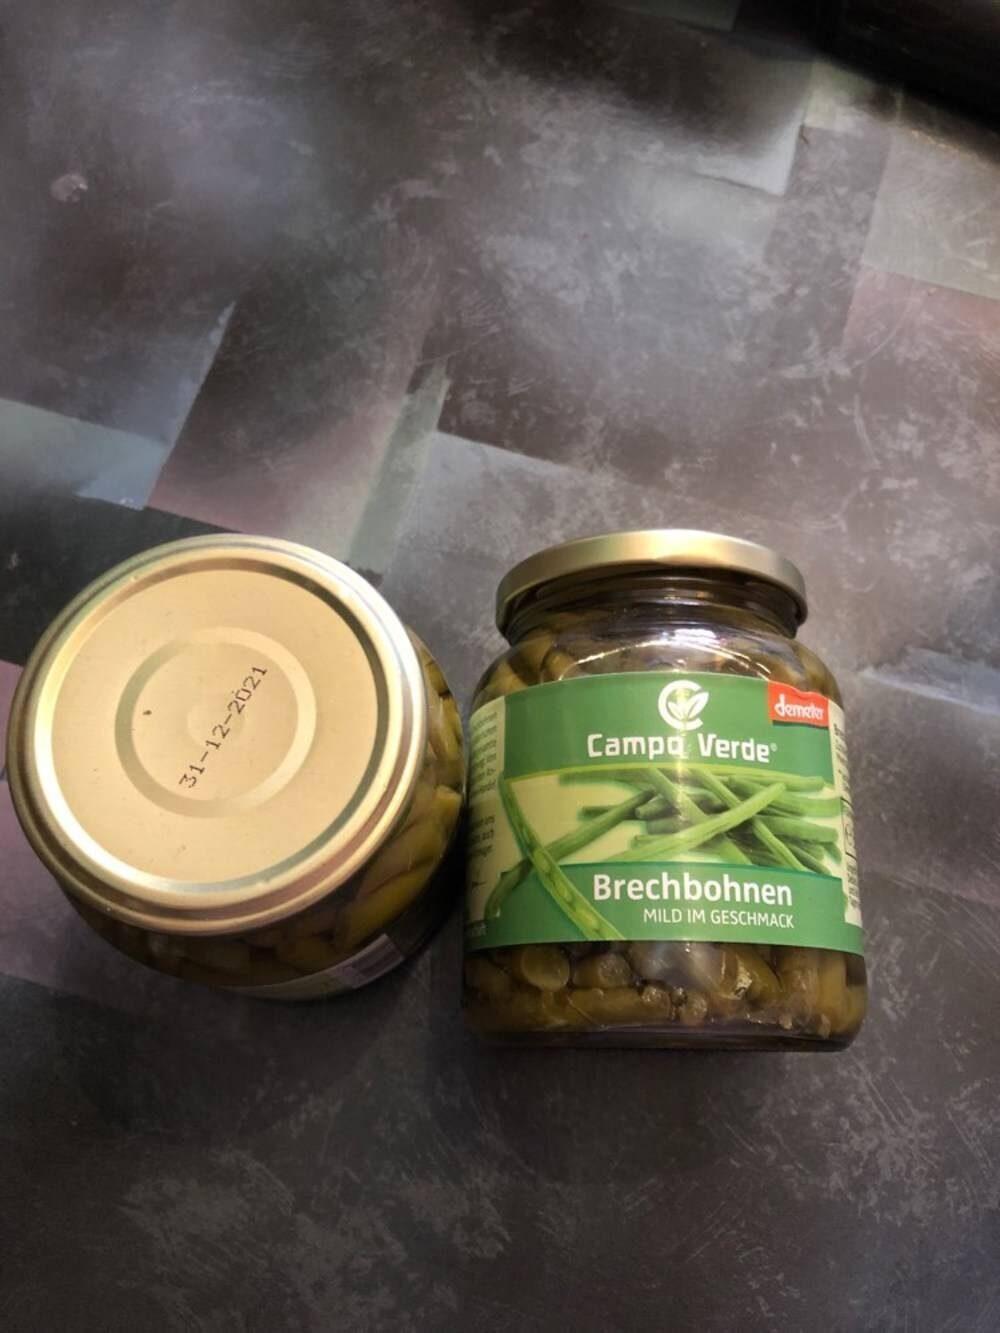 Brechbohnen - Product - de